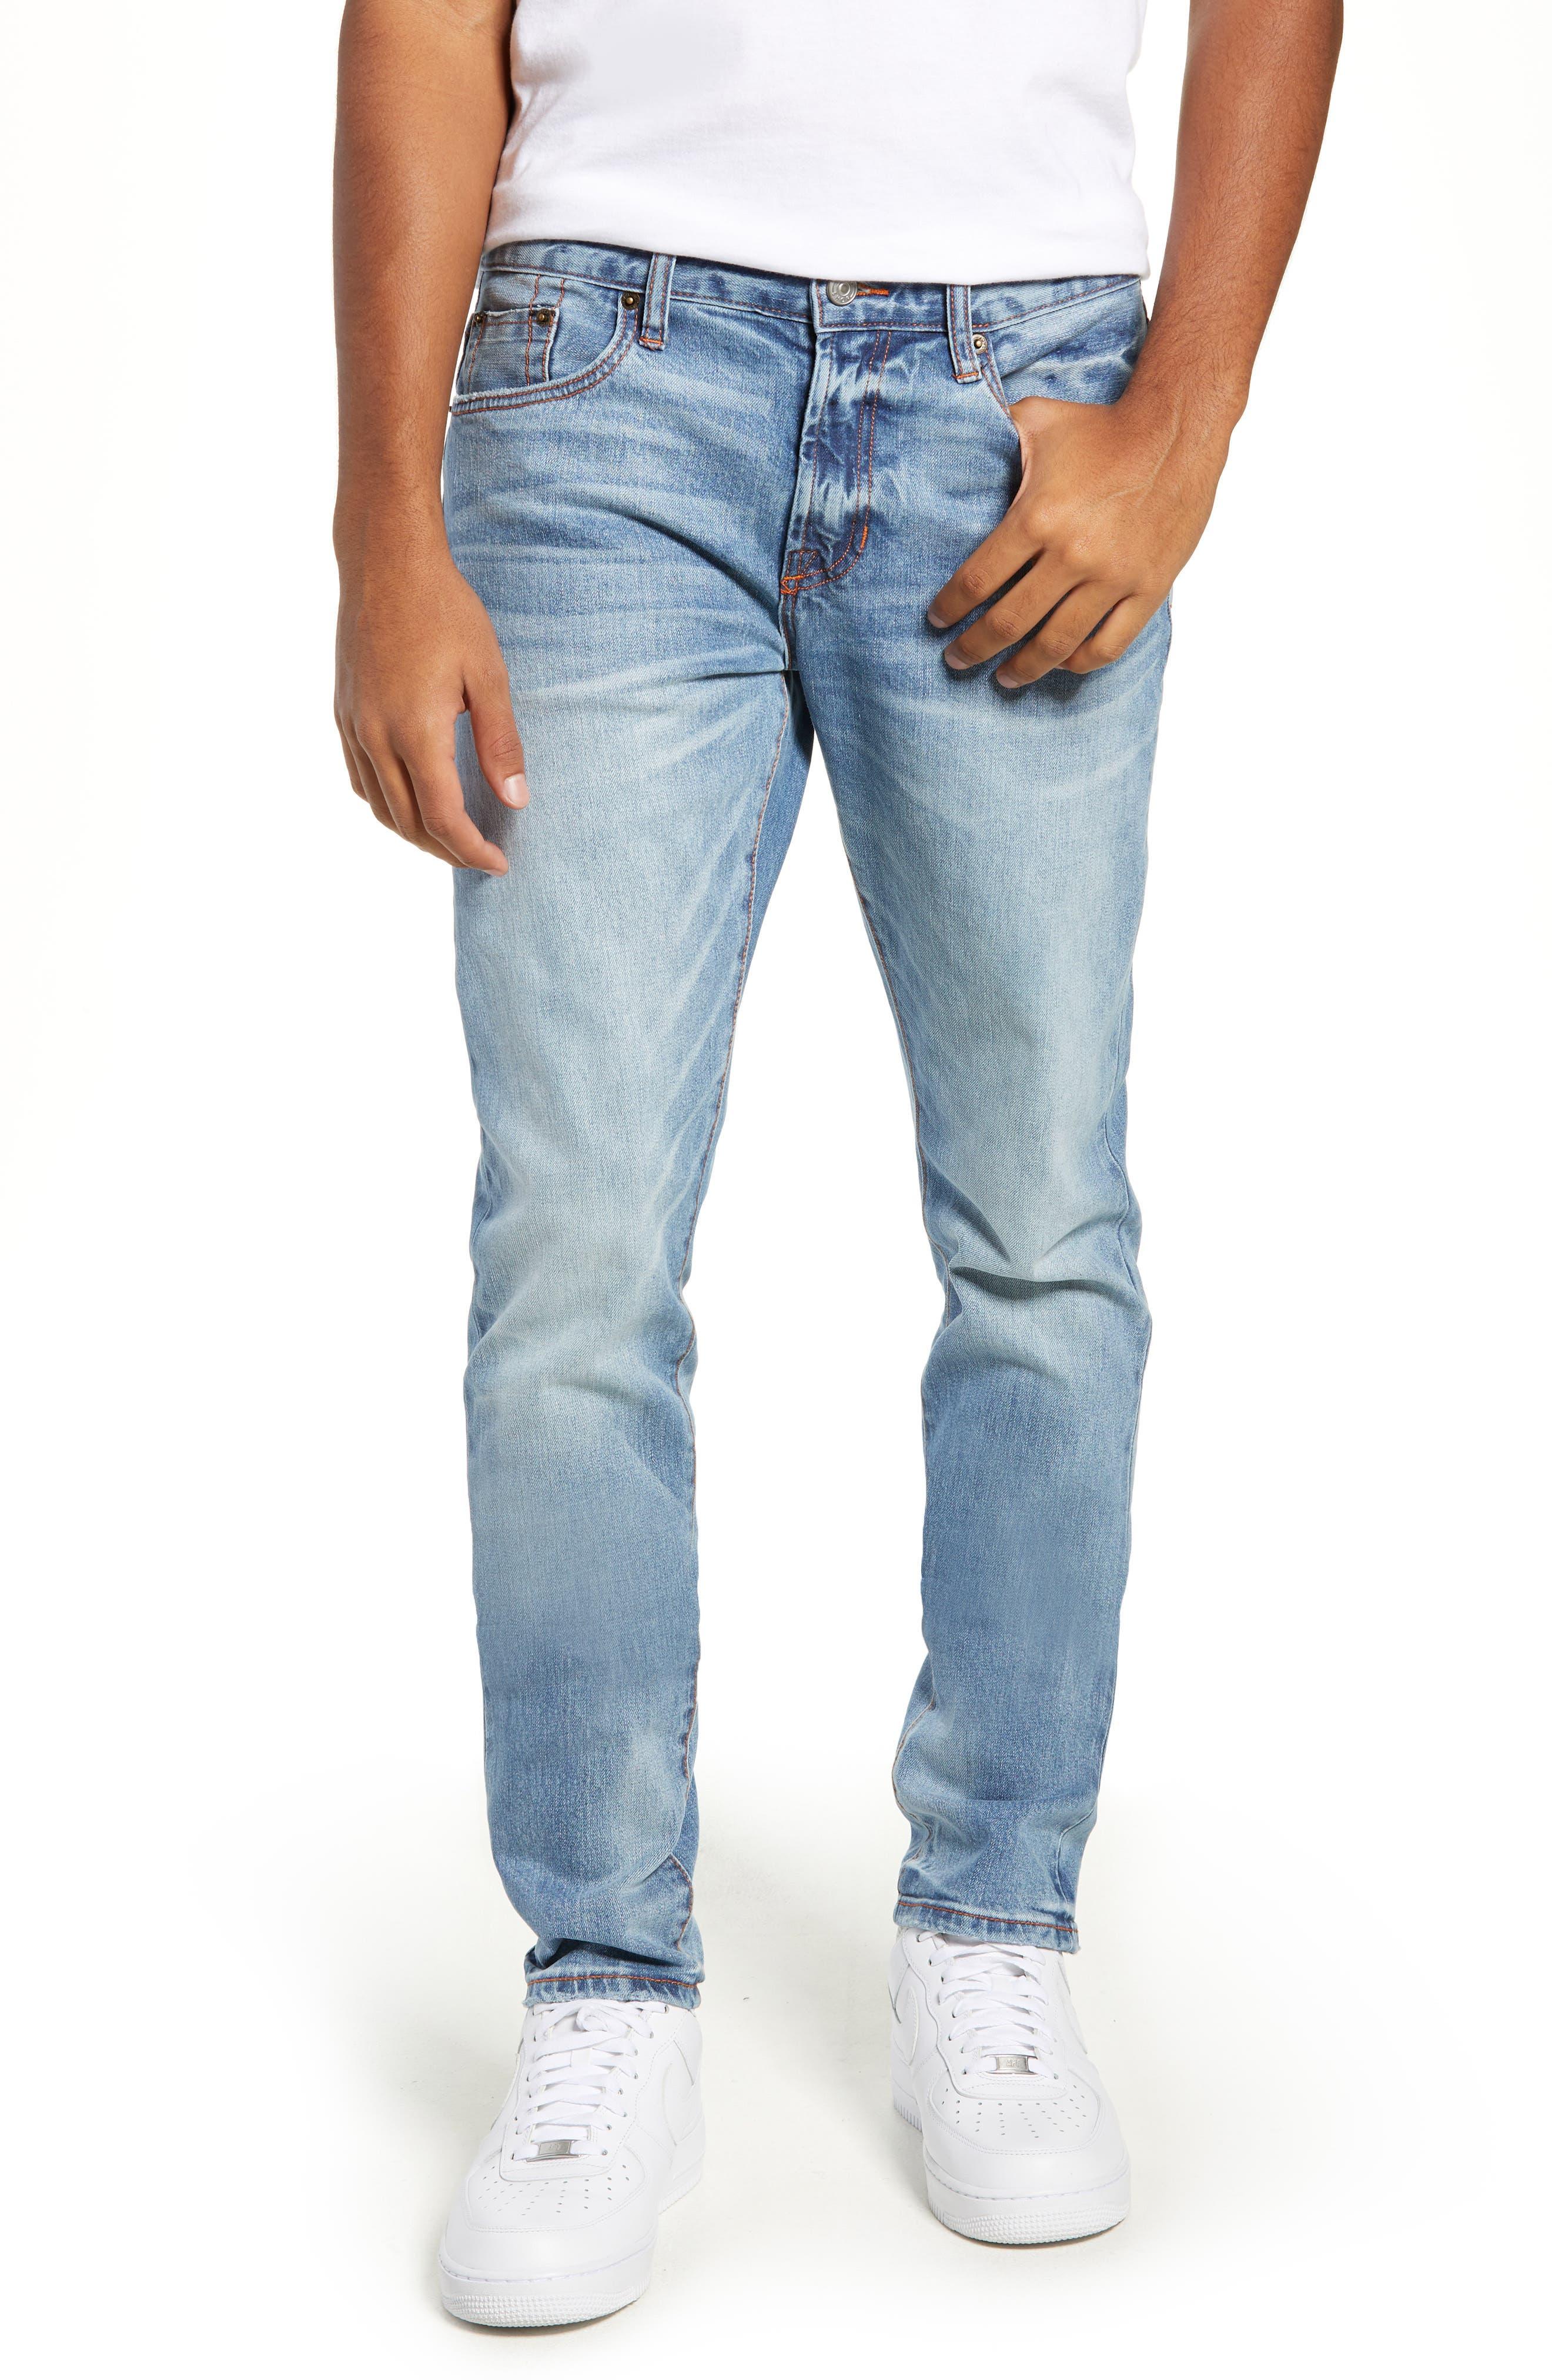 Jim Slim Fit Jeans,                         Main,                         color, BROOME